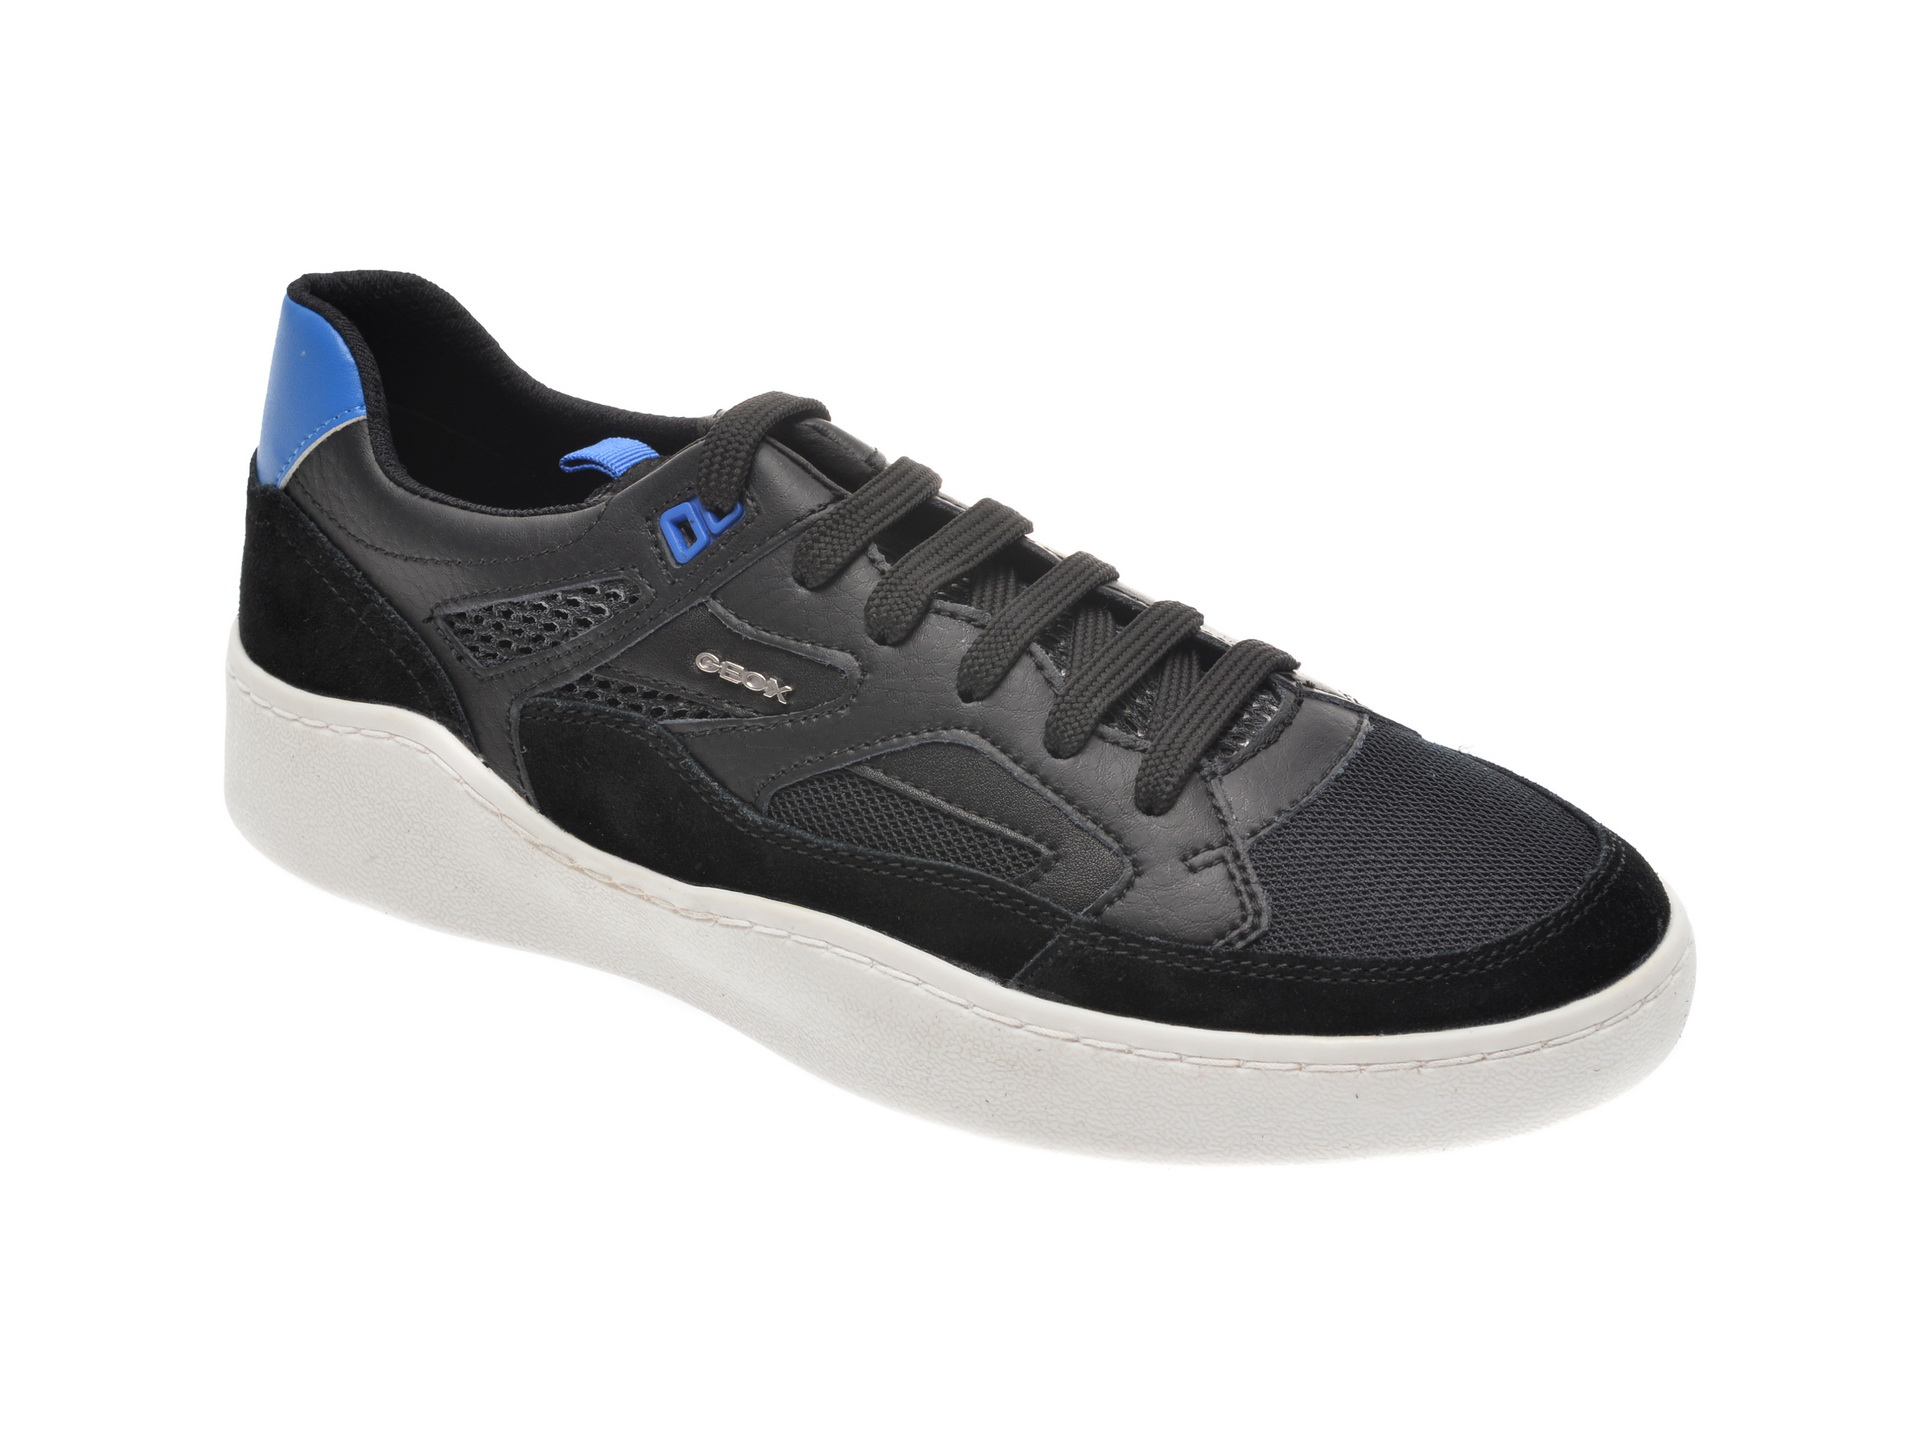 Pantofi sport GEOX negri, U027XA, din material textil si piele naturala imagine